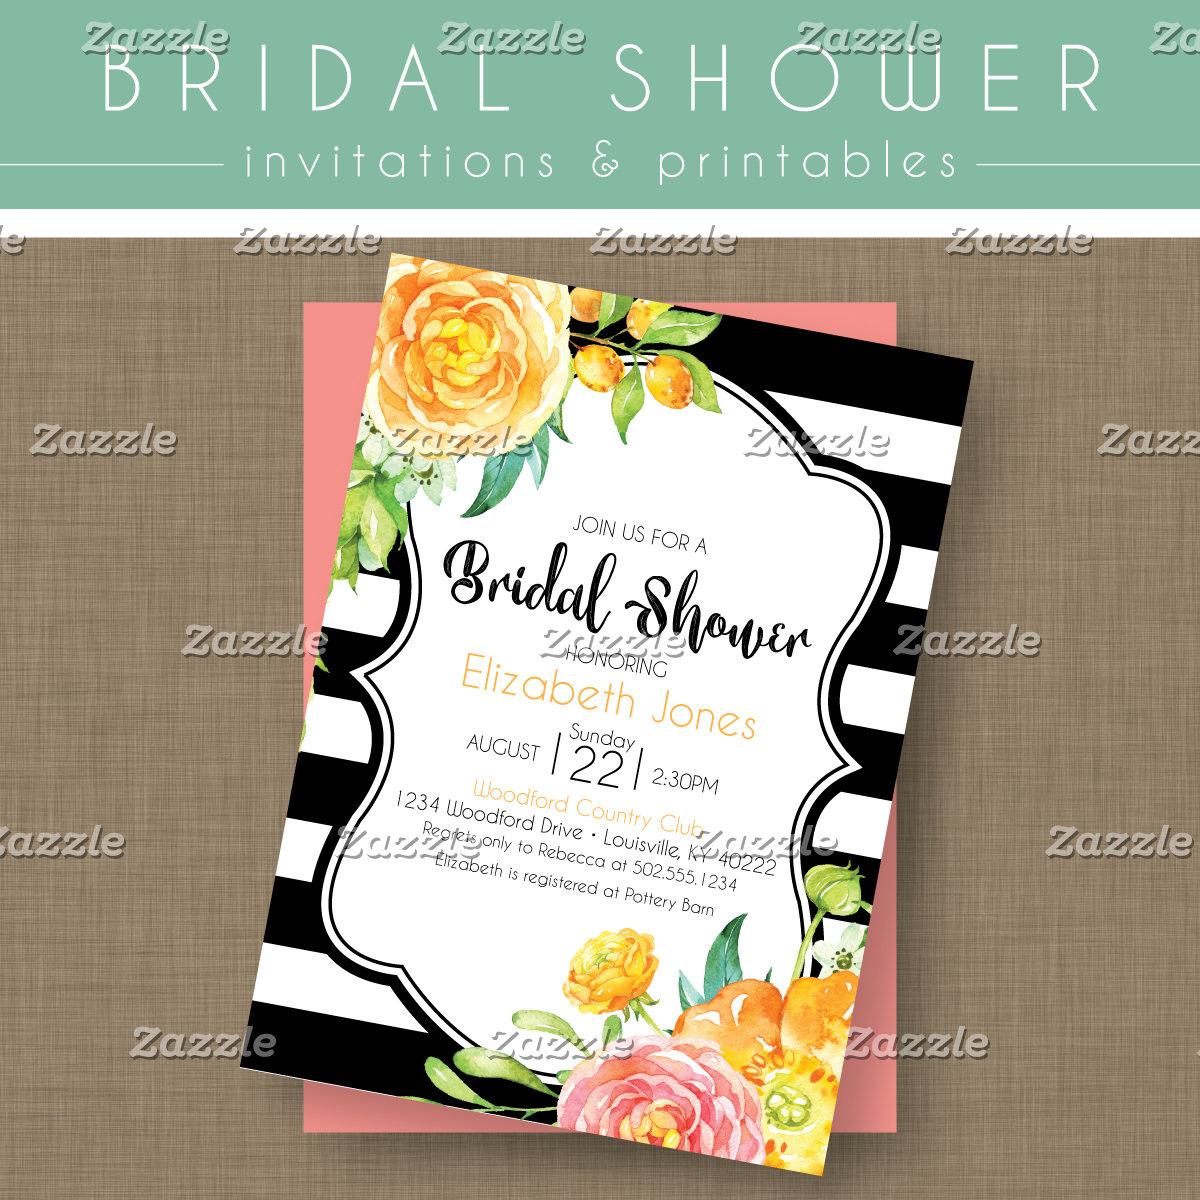 Bridal Shower/Engagement